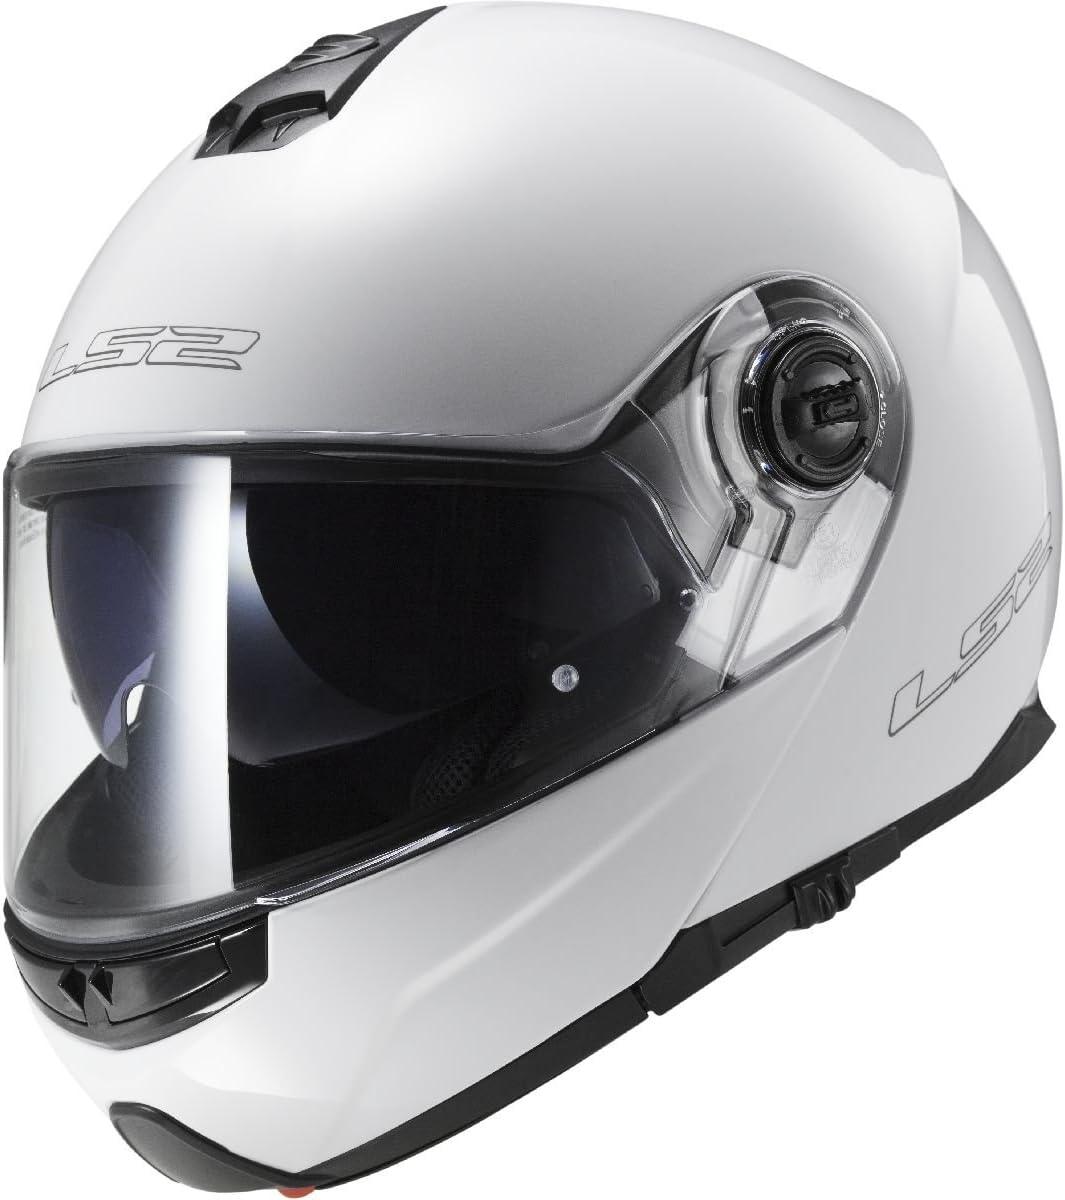 LS2 Helmets Strobe Solid Modular Motorcycle Helmet with Sunshield Gunmetal, Large by LS2 Helmets